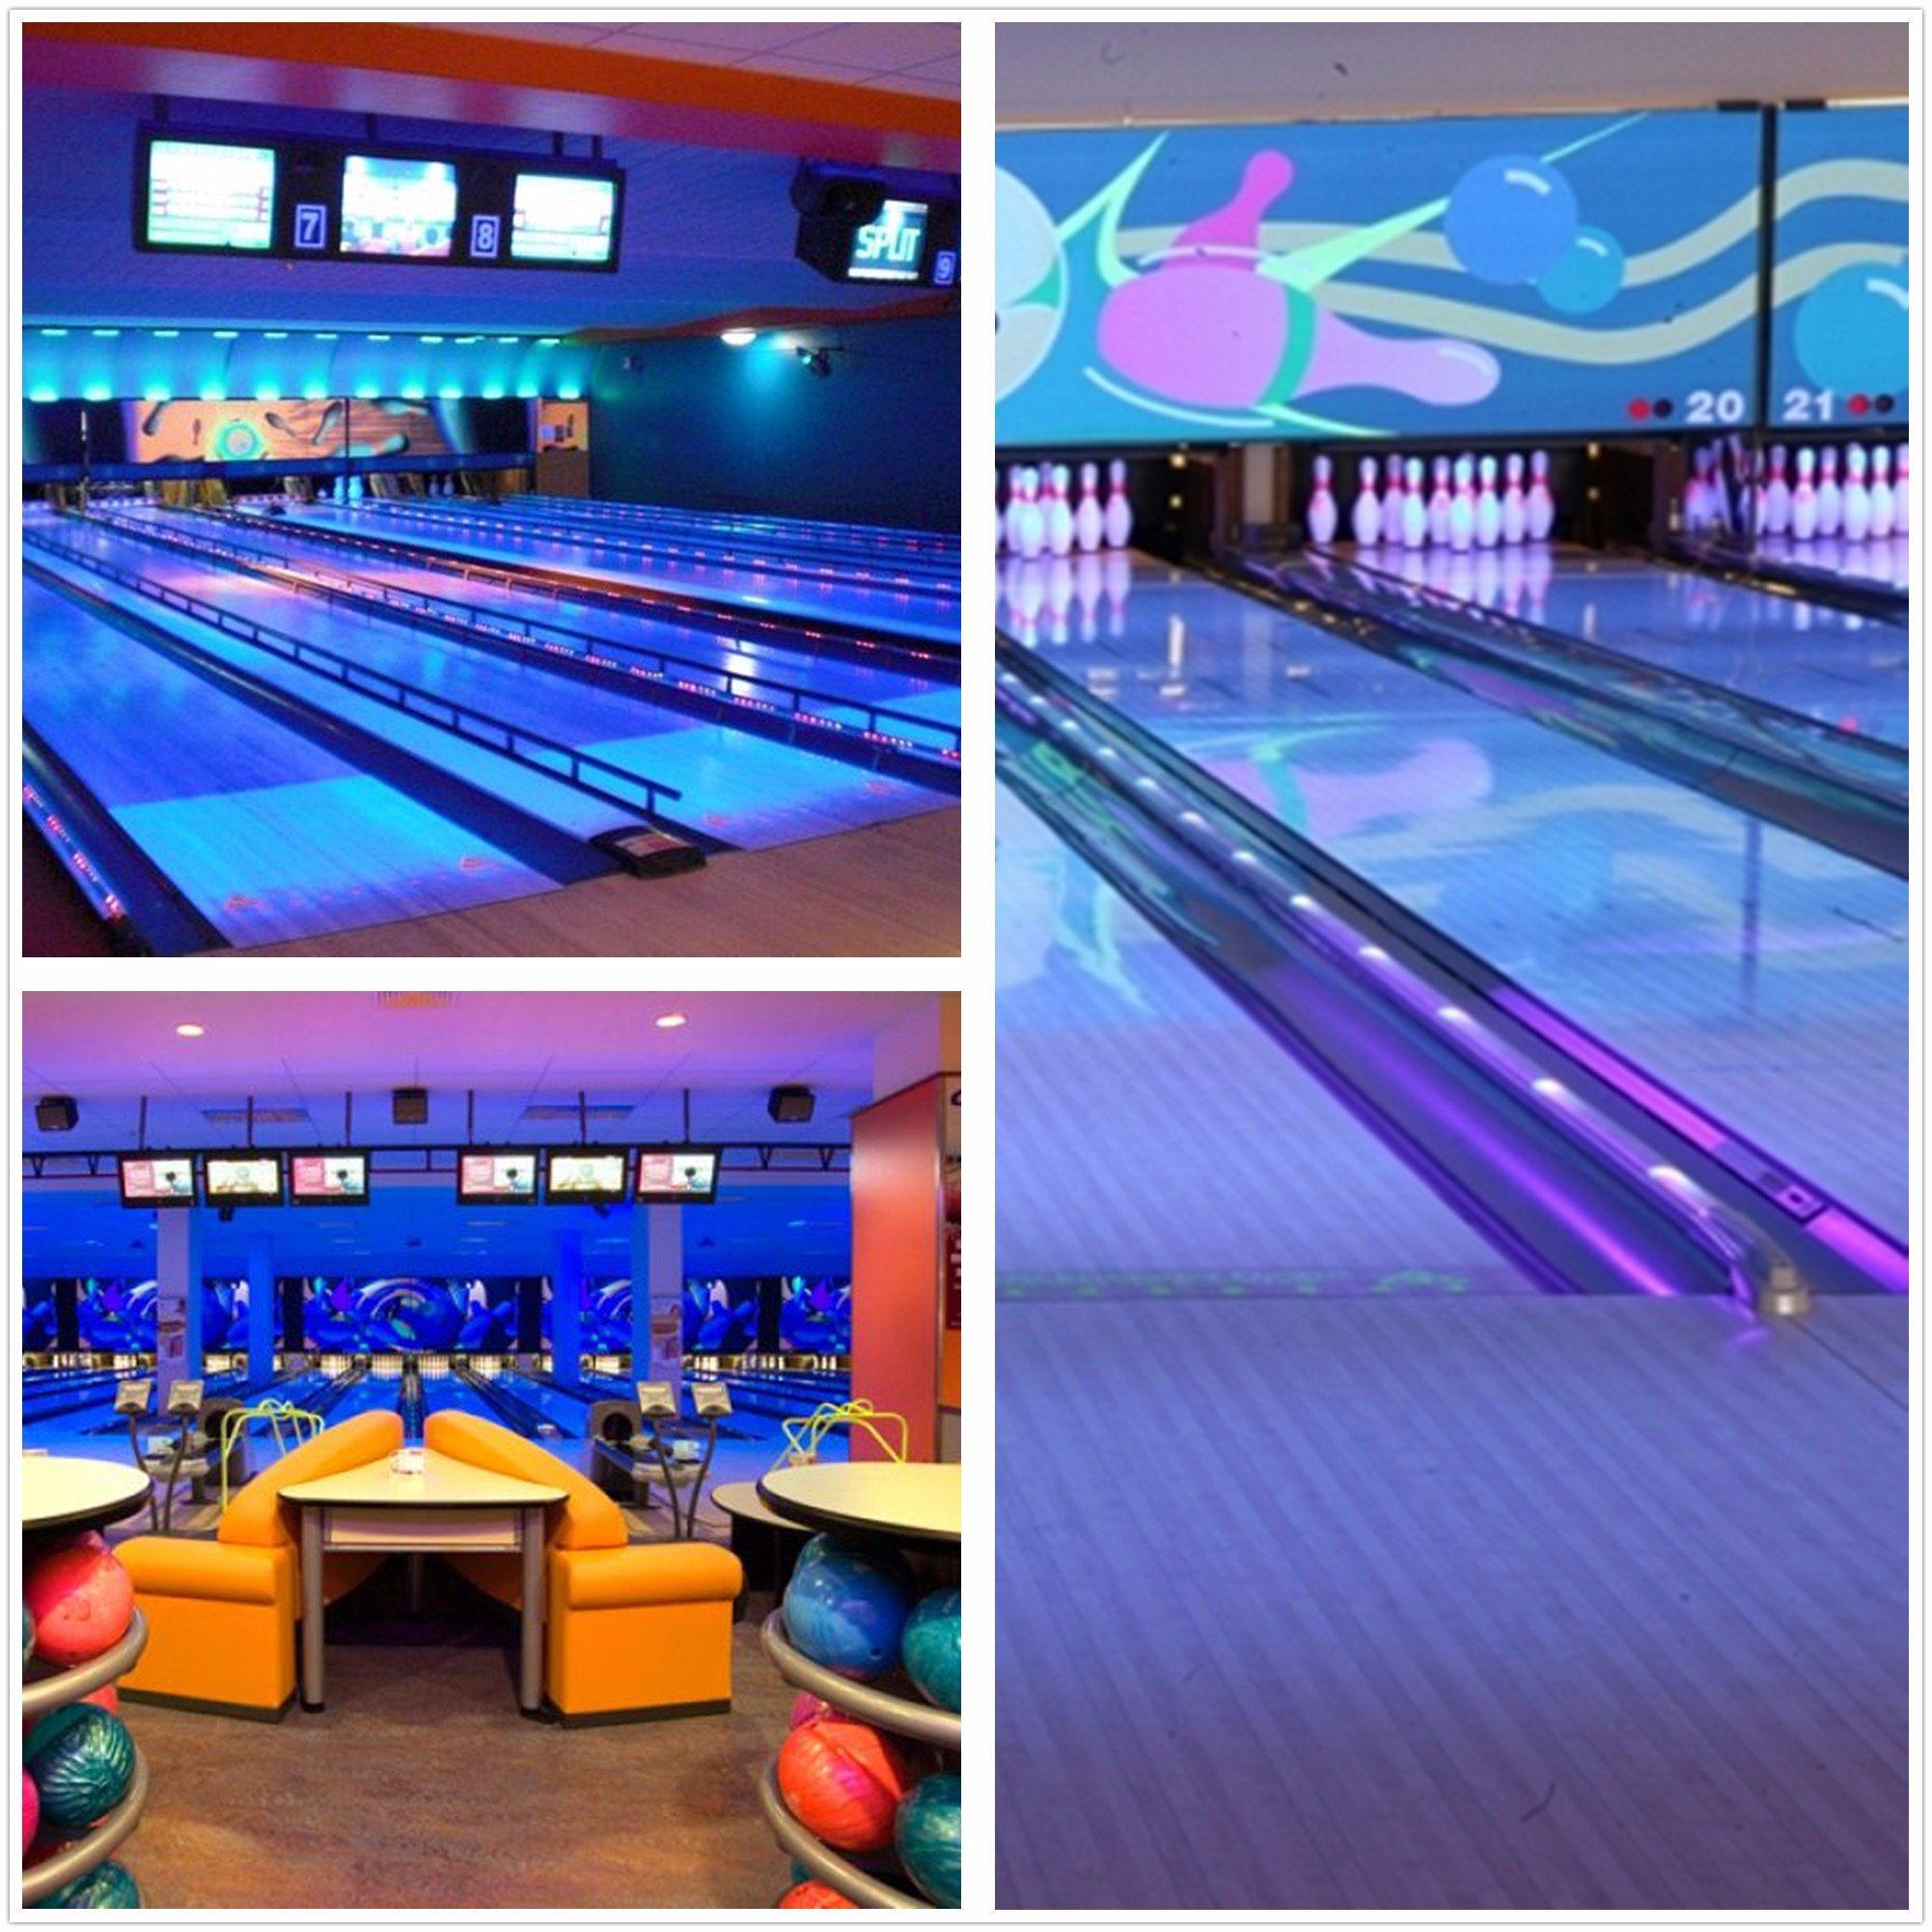 Bowling Equipment for USA Original Bowling Equipment Bowling Lane